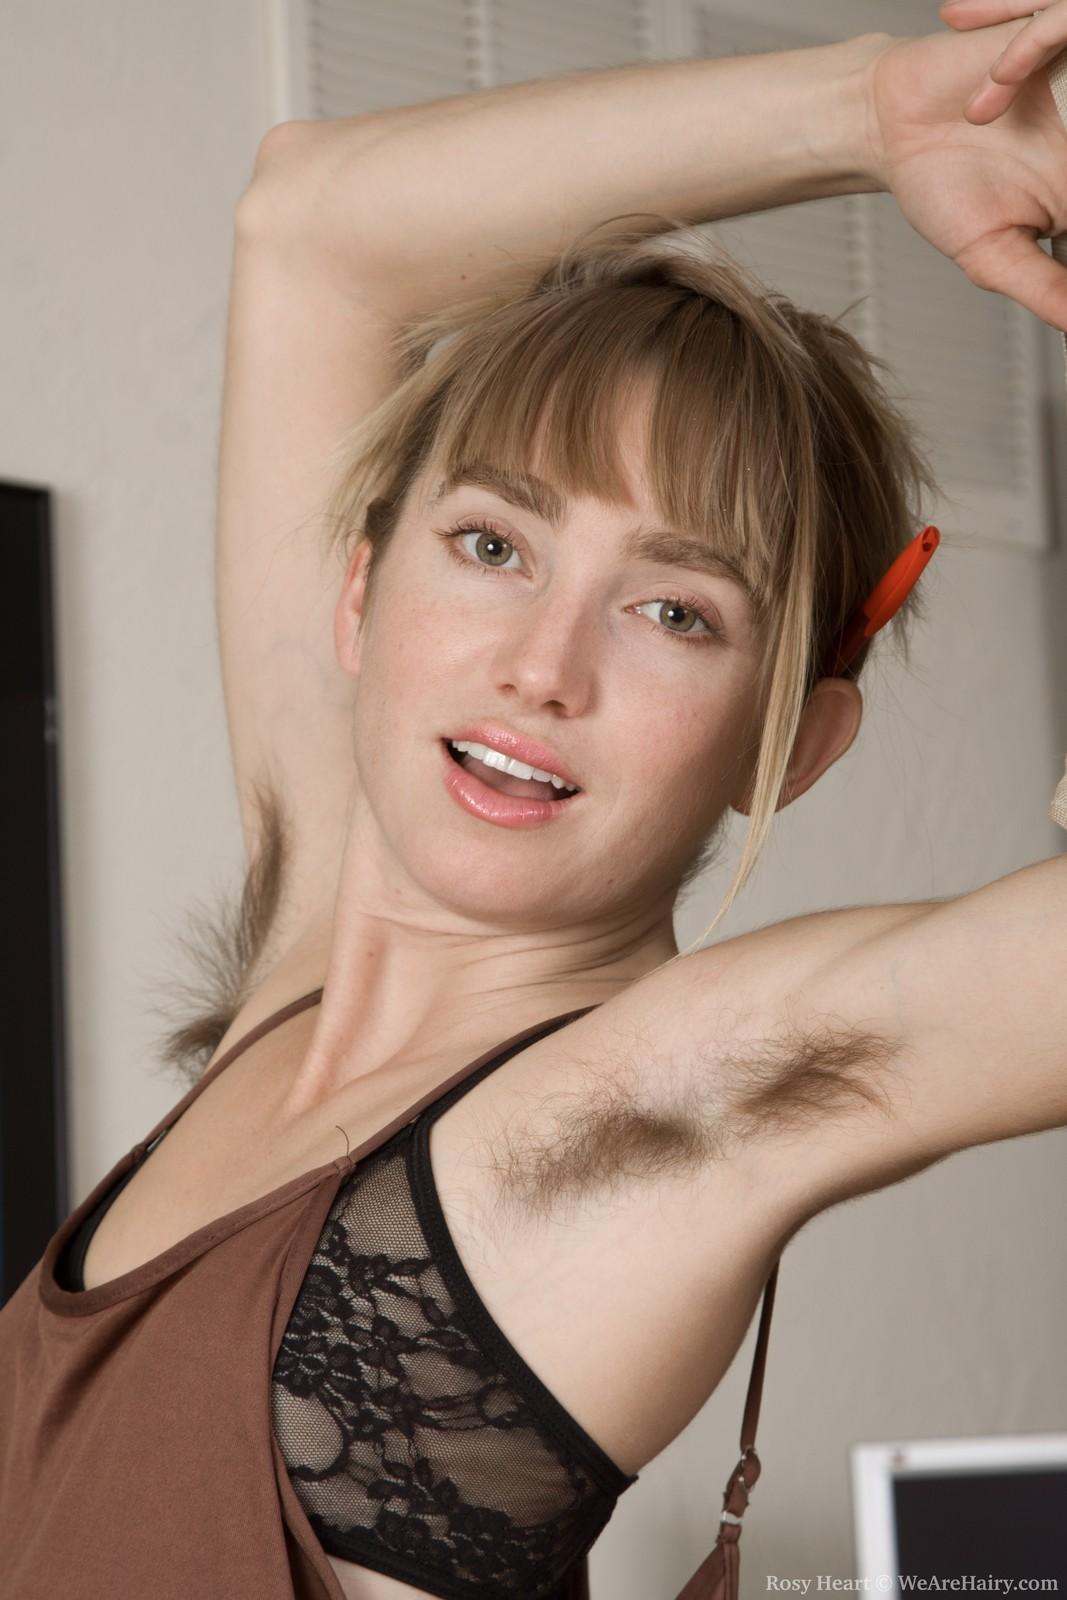 Curvy sexy women pics-9772